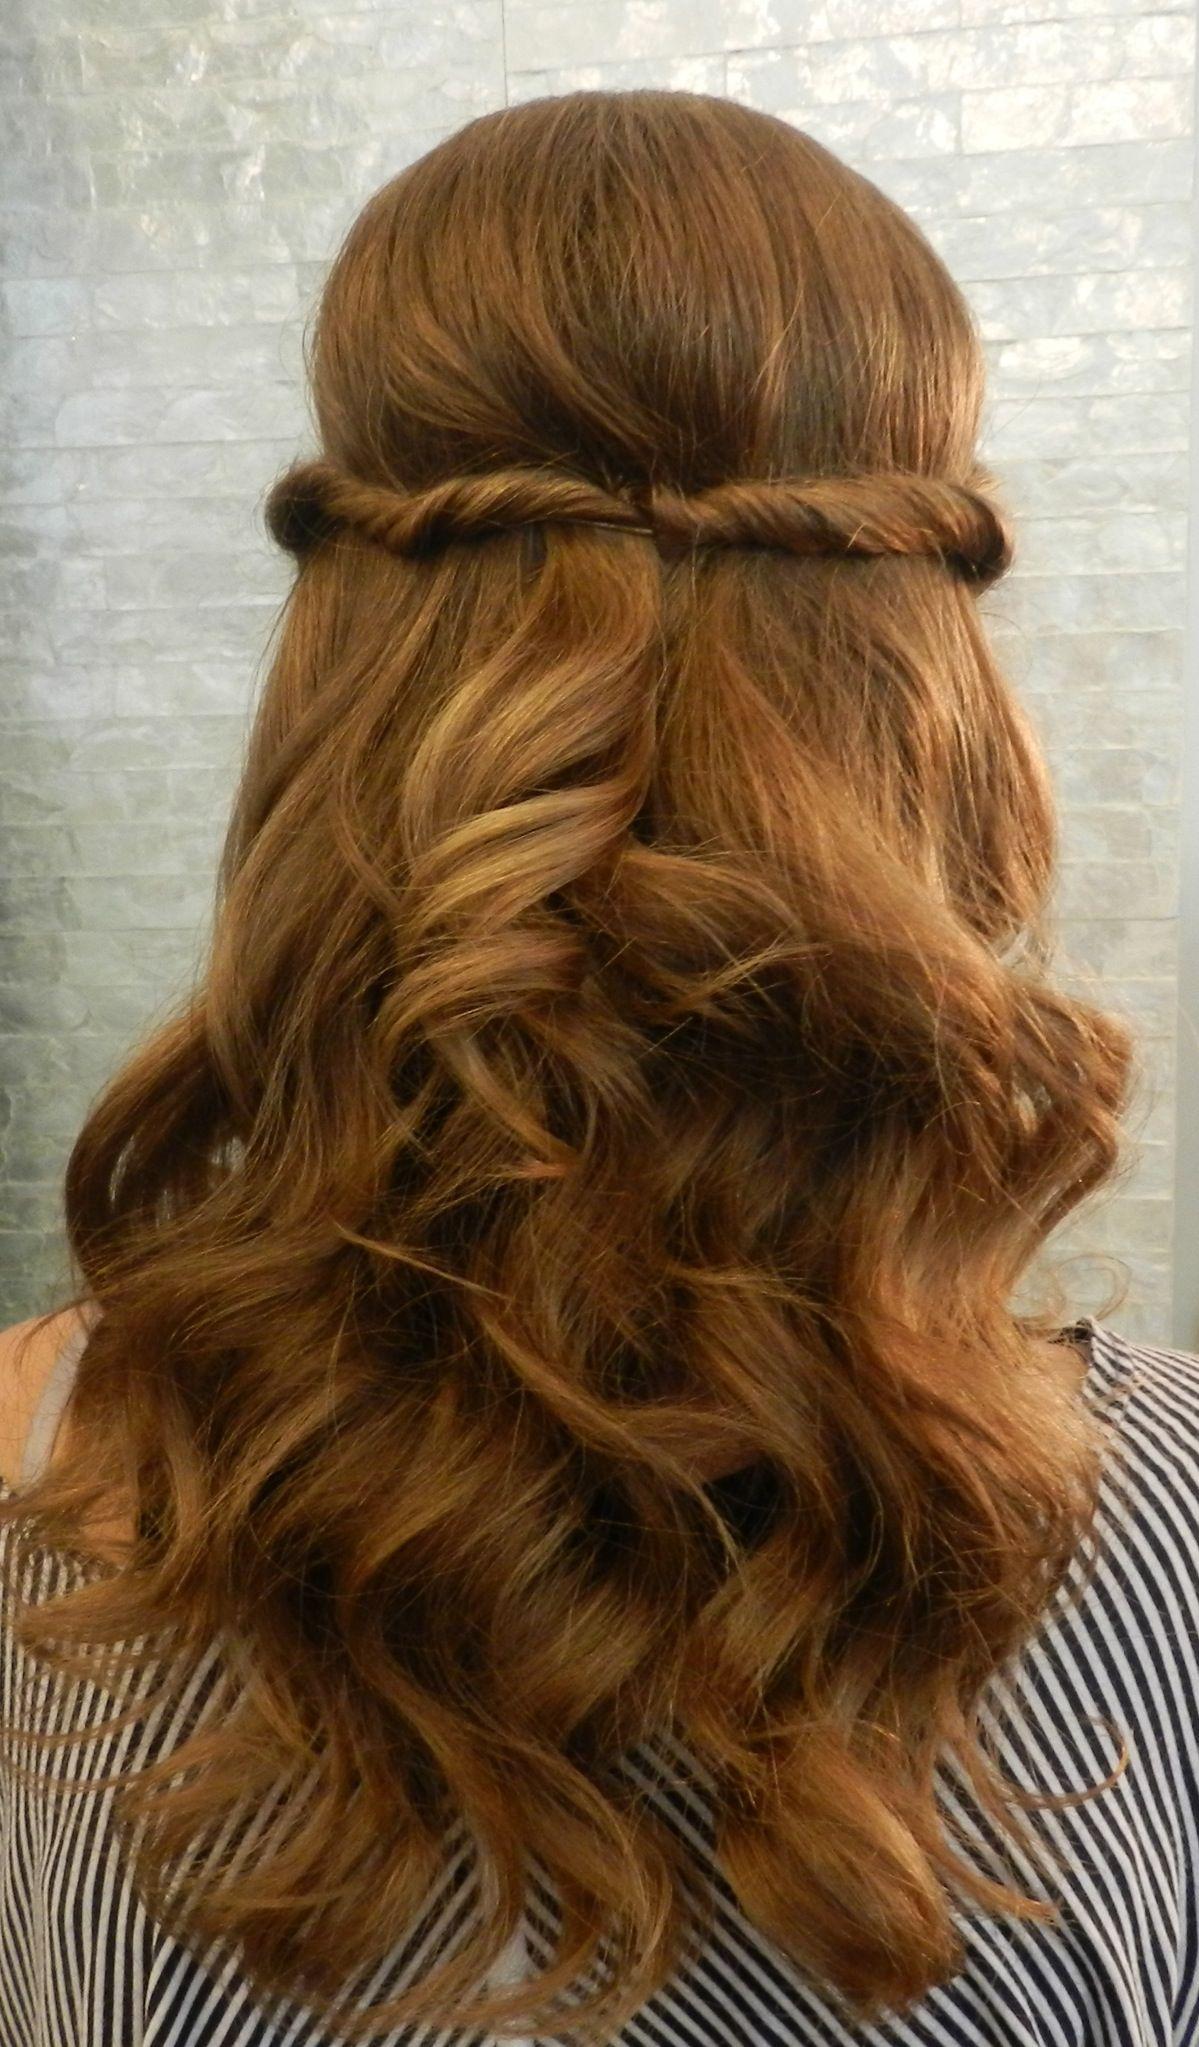 8th grade graduation hair, so cute! half up updo. - by tina